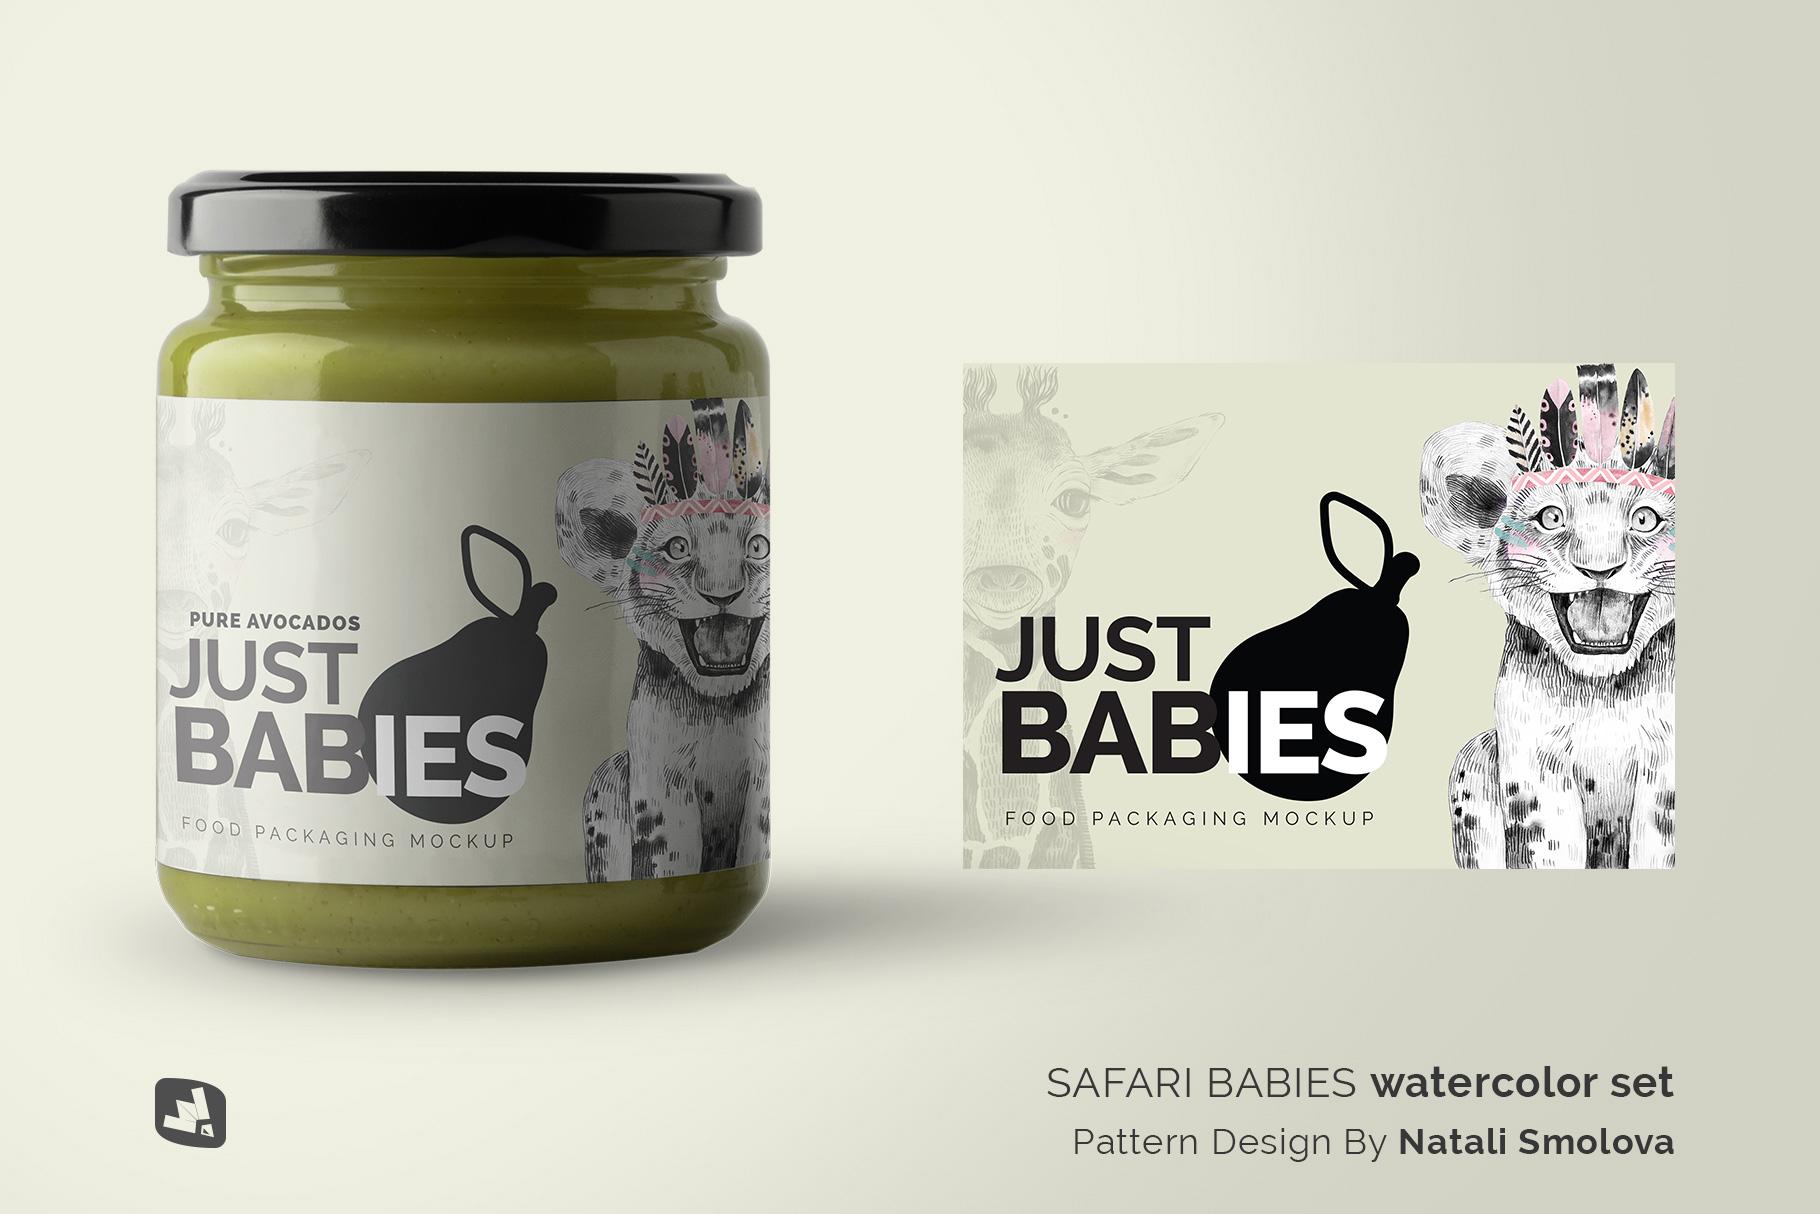 designer's credit of the organic baby food packaging mockup